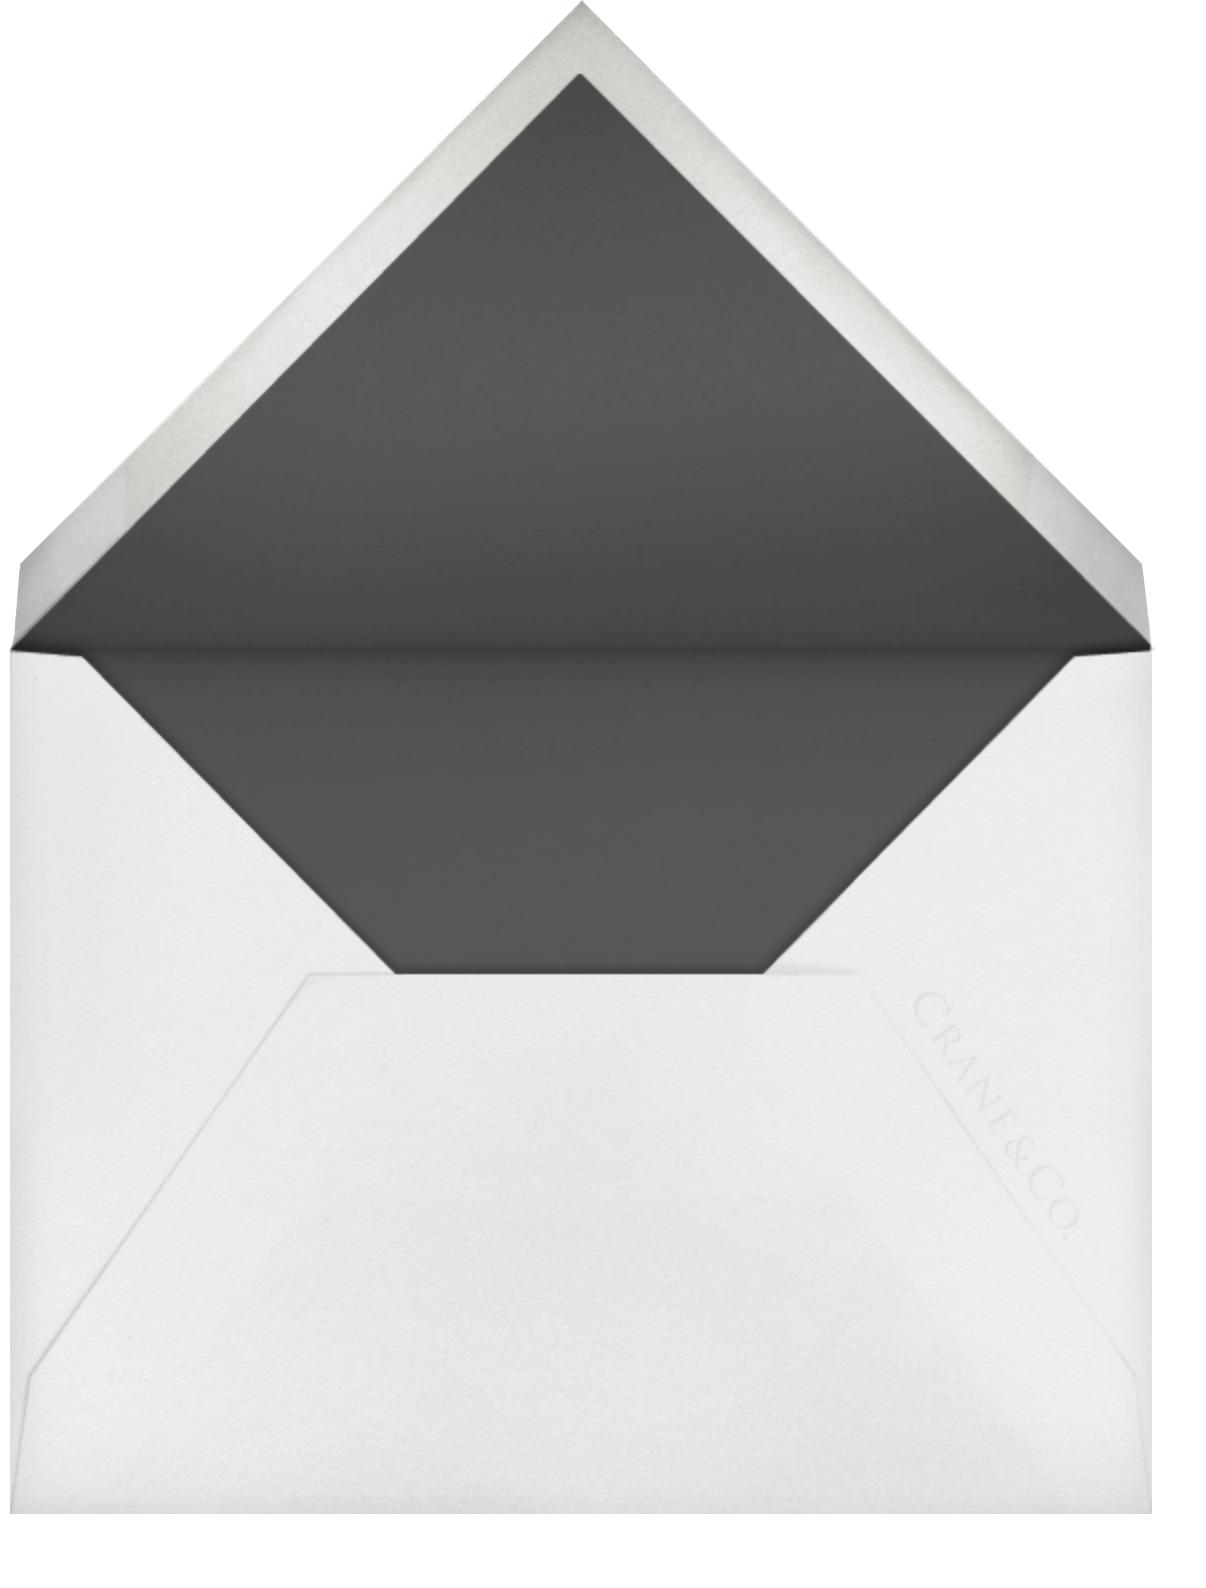 Lacquer (Invitation) - Medium Gold - Crane & Co. - All - envelope back